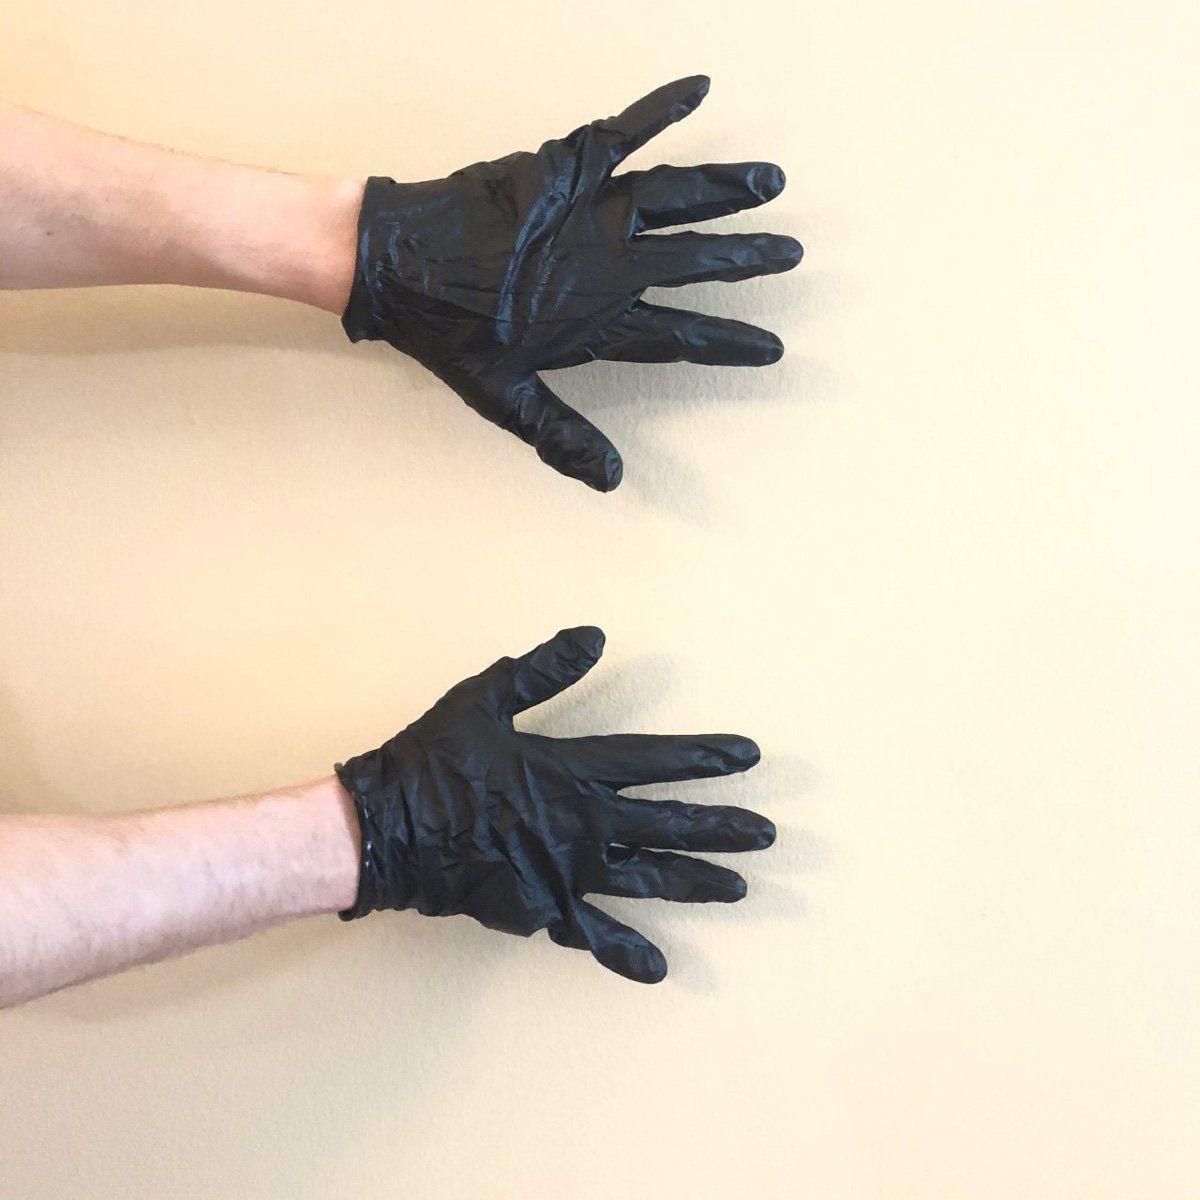 Hands with black nitrile gloves